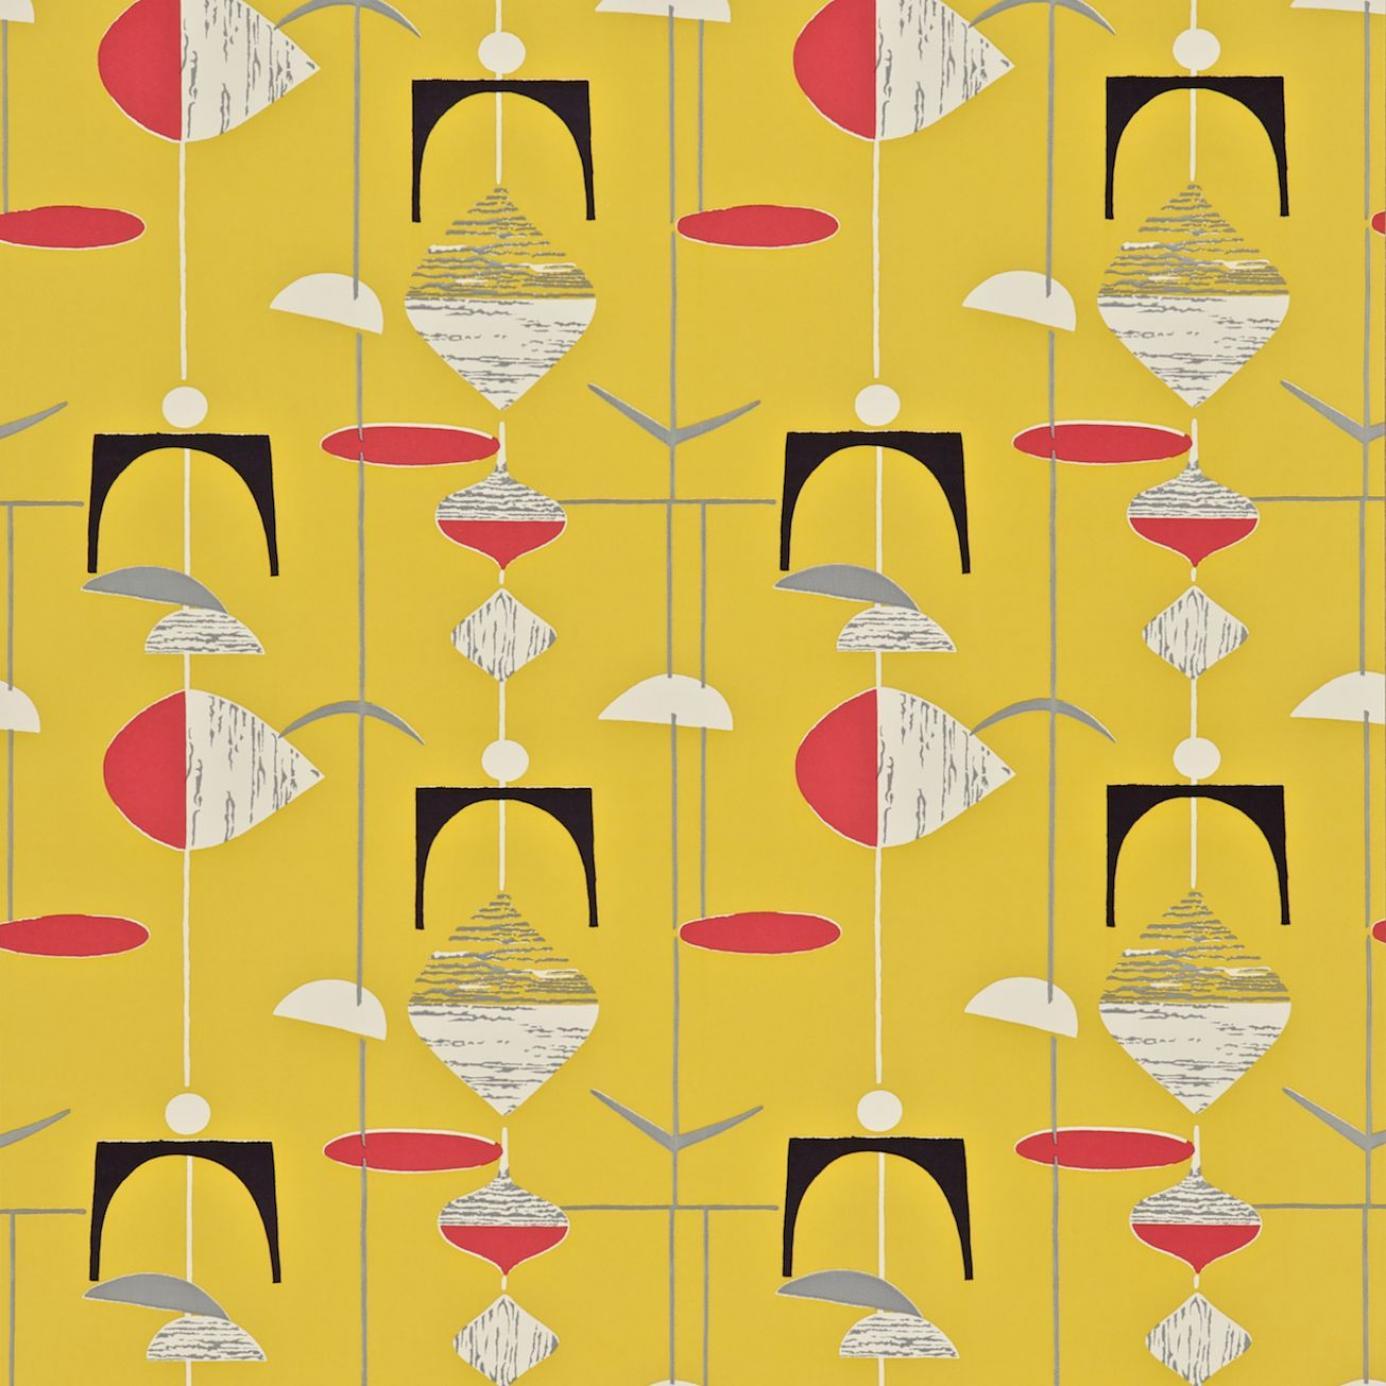 Mobiles wallpaper yellow red 210213 sanderson 50 39 s 50s home decor uk